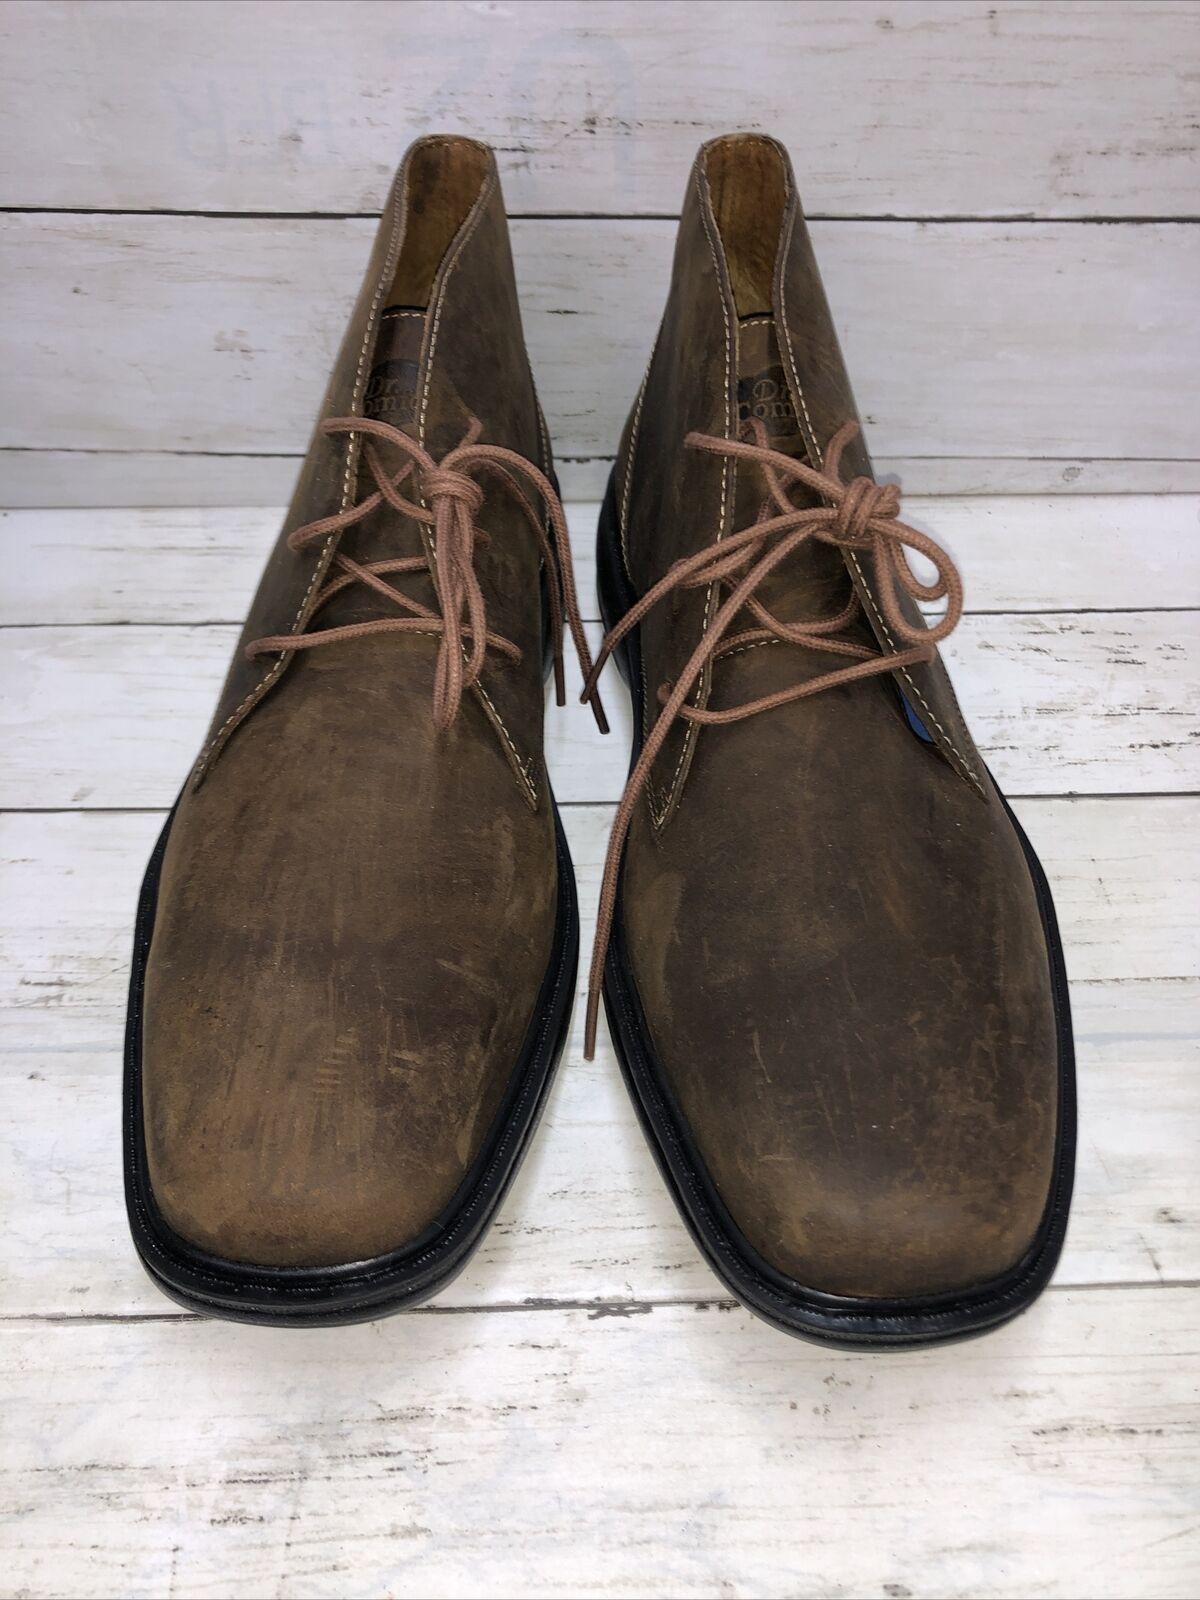 D9 Dr Comfort Ruk 7920 Men's Sz 11M Brown Leather Chukka Boots Pressure Relief